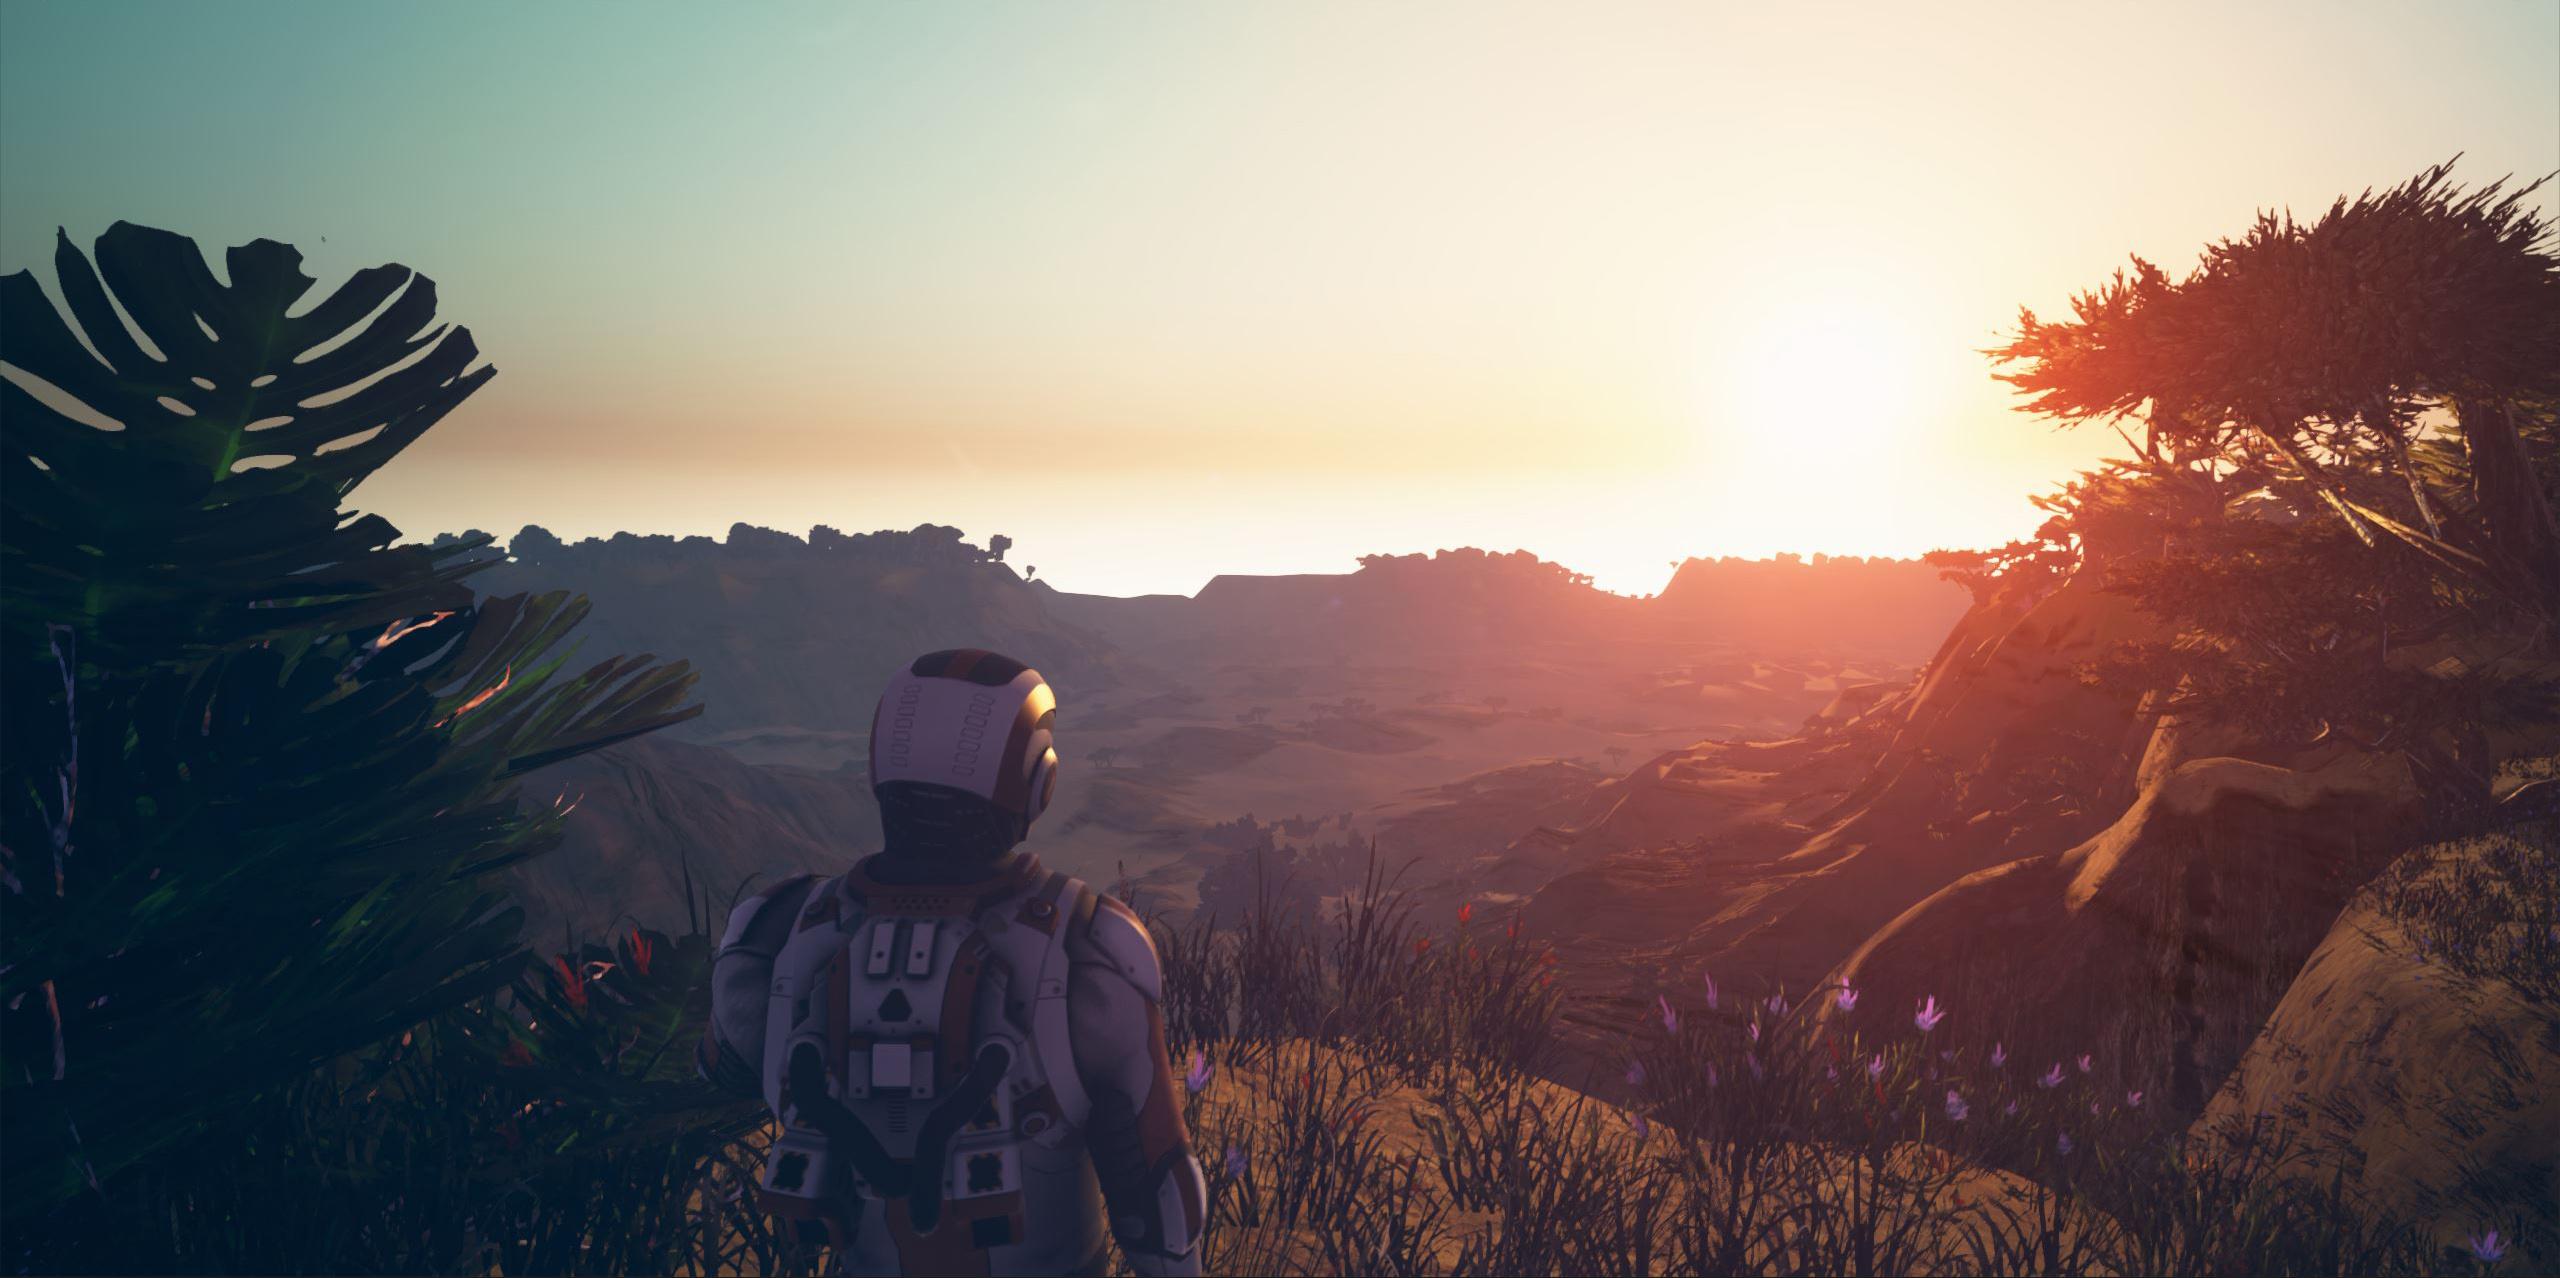 Westworld in Planet Nomads